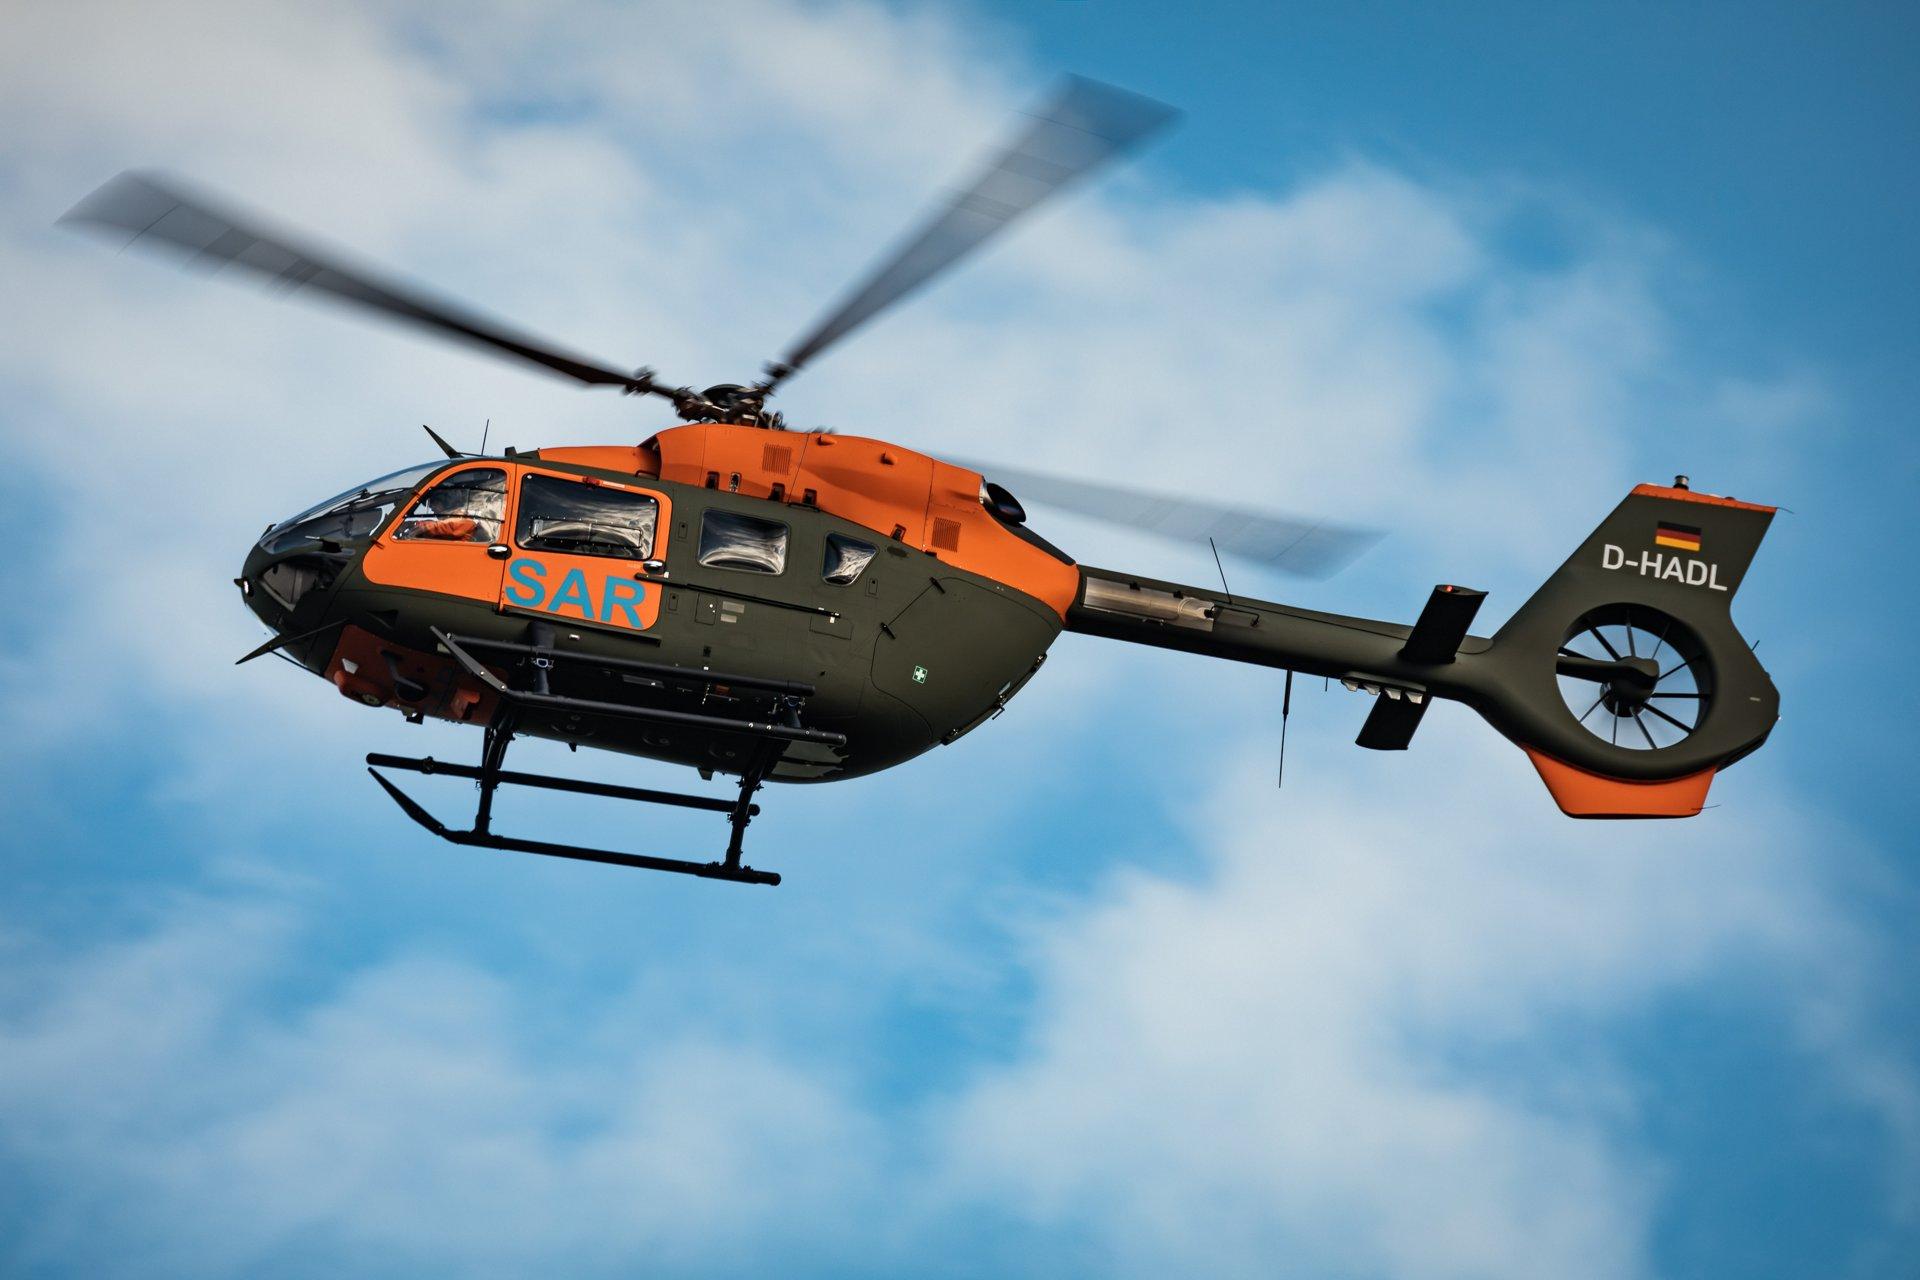 SAR-helikopter van het Duitse leger (Foto Airbus)